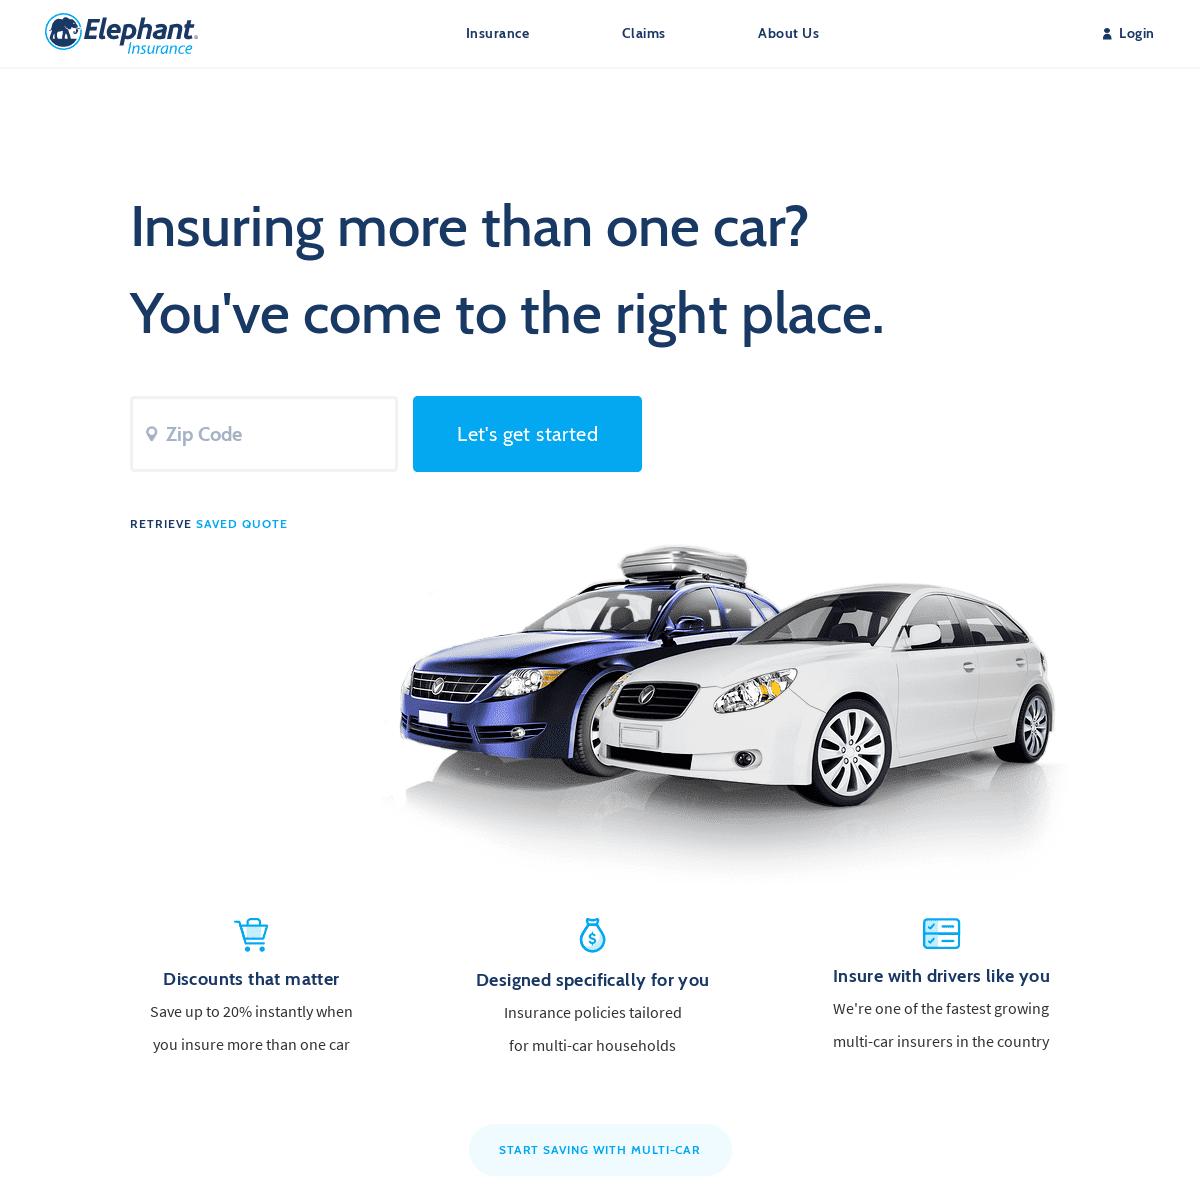 Elephant Insurance - Car Insurance That Makes Sense